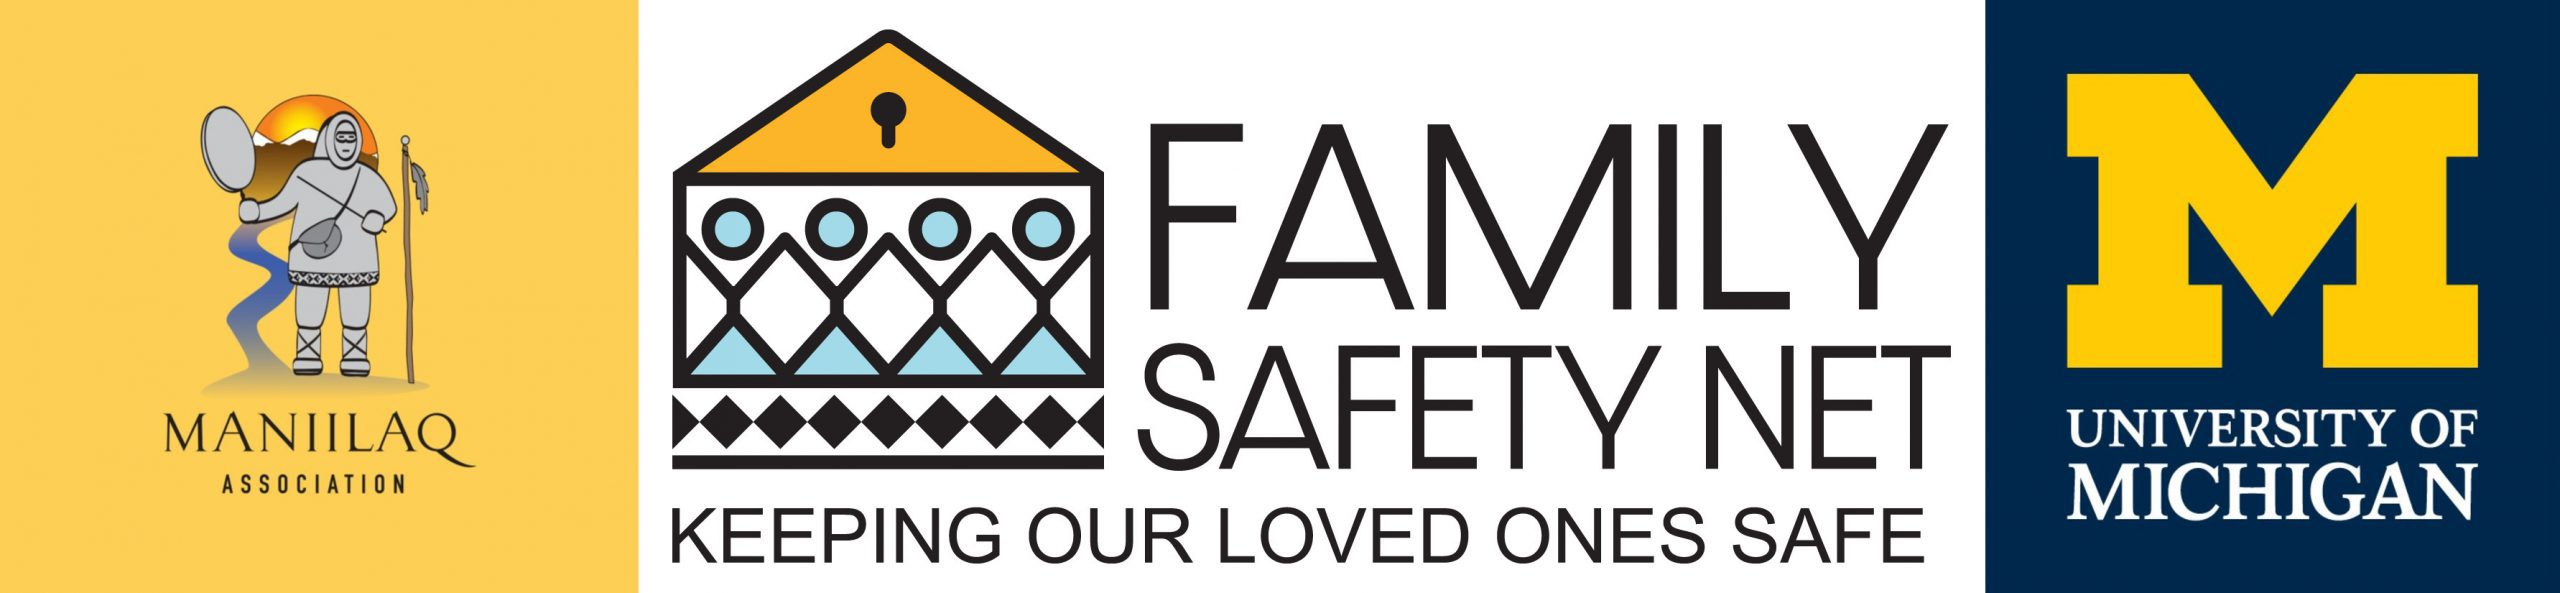 Family Safety Net